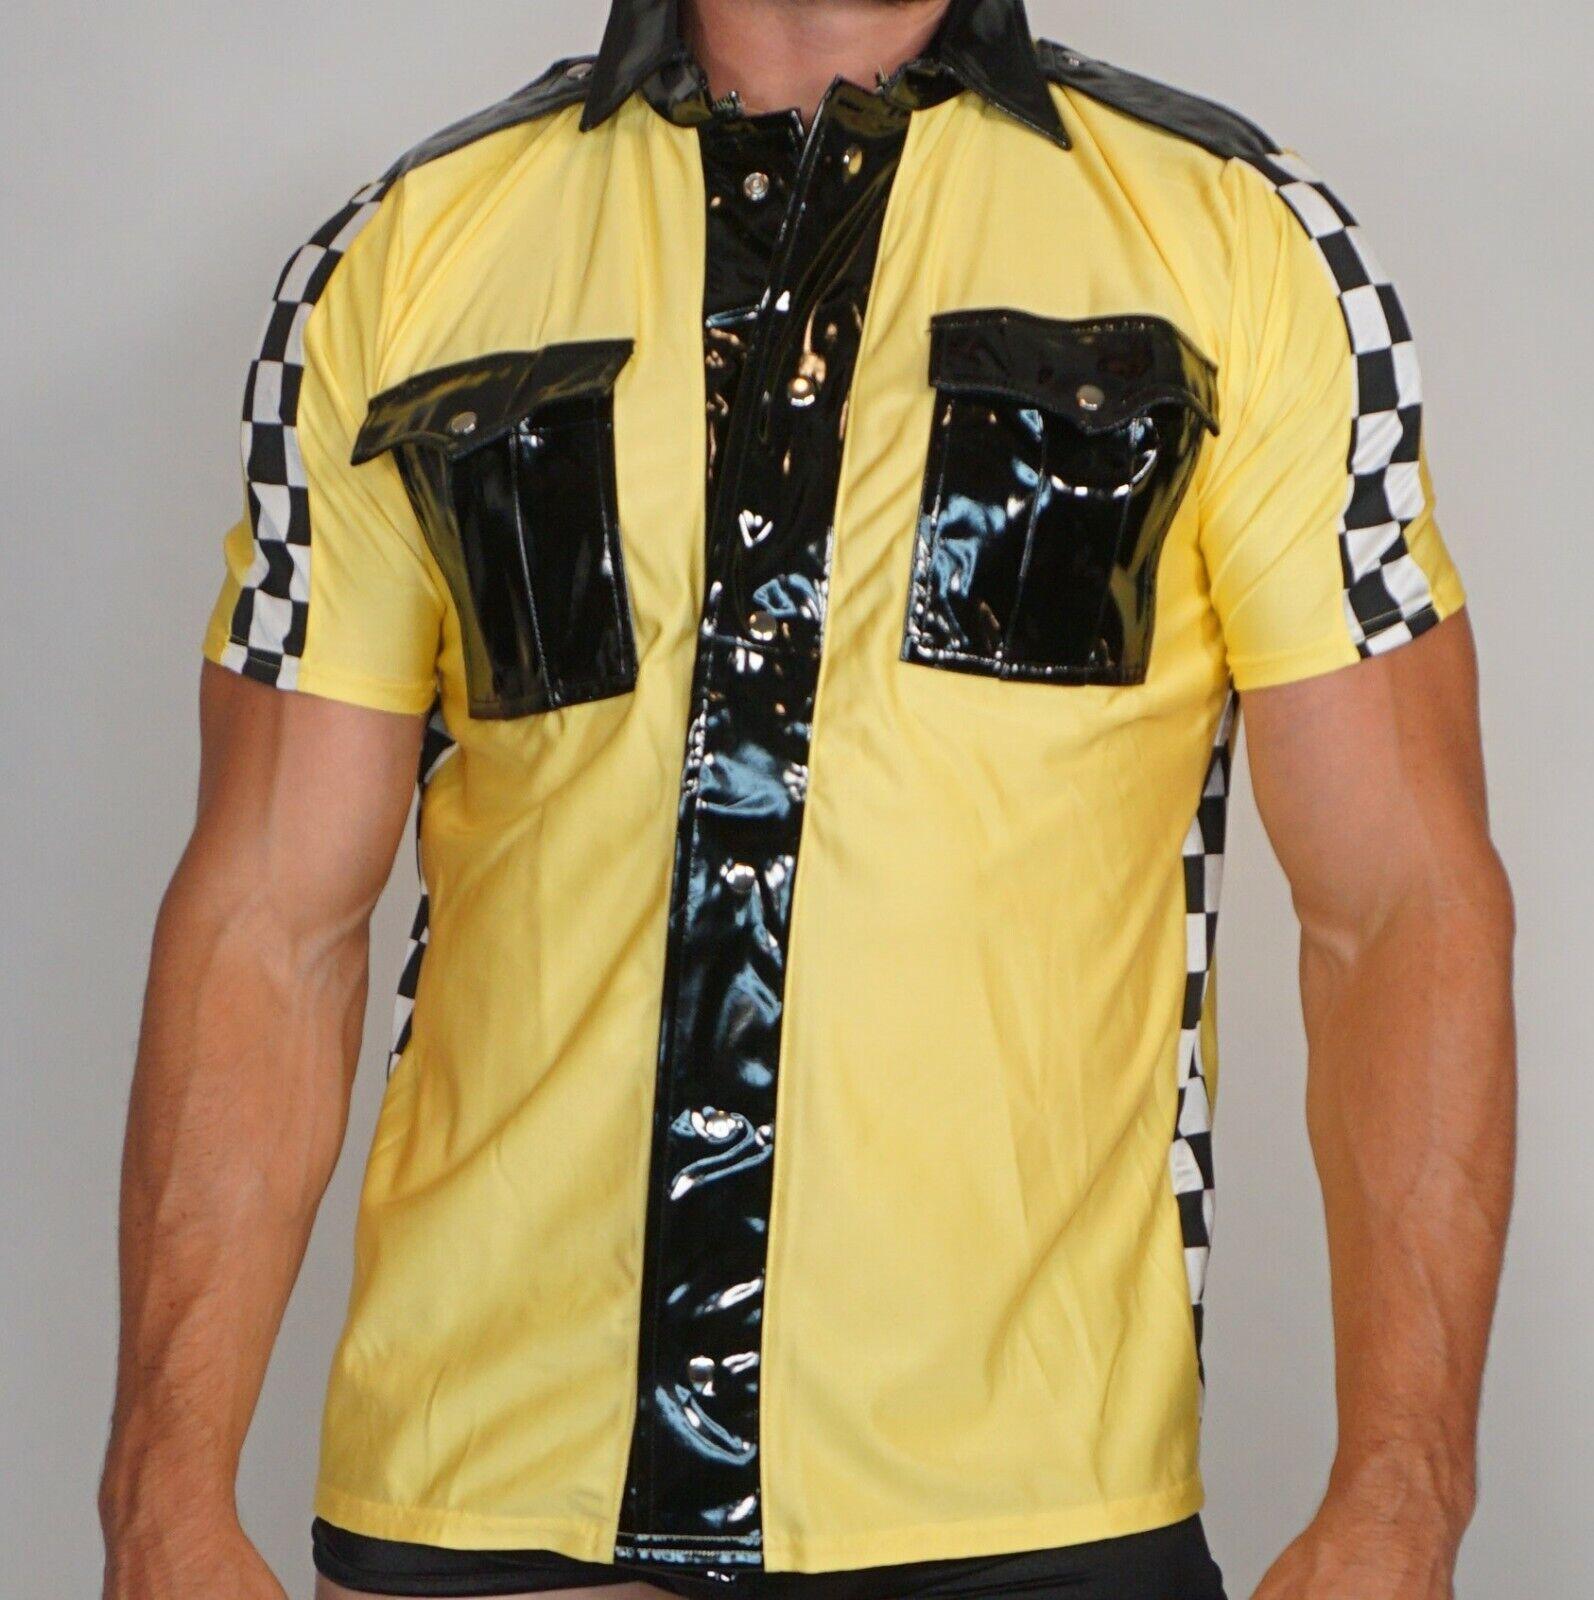 Adult Men's TAXI COSTUME L/XL (SHIRT & HAT) MALE STRIPPER